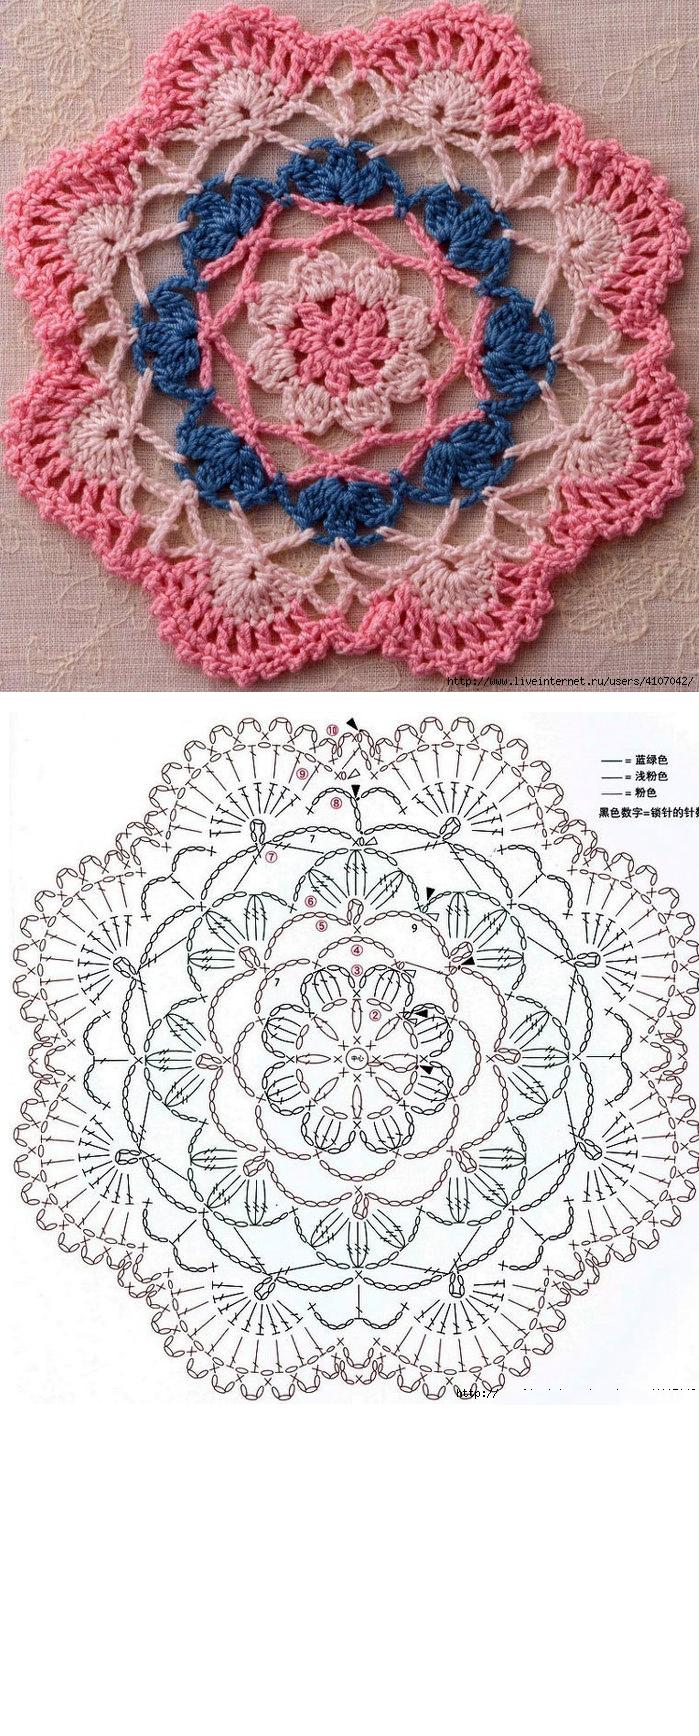 Pin von Shipagua Barcena auf cuadros crochet | Pinterest ...